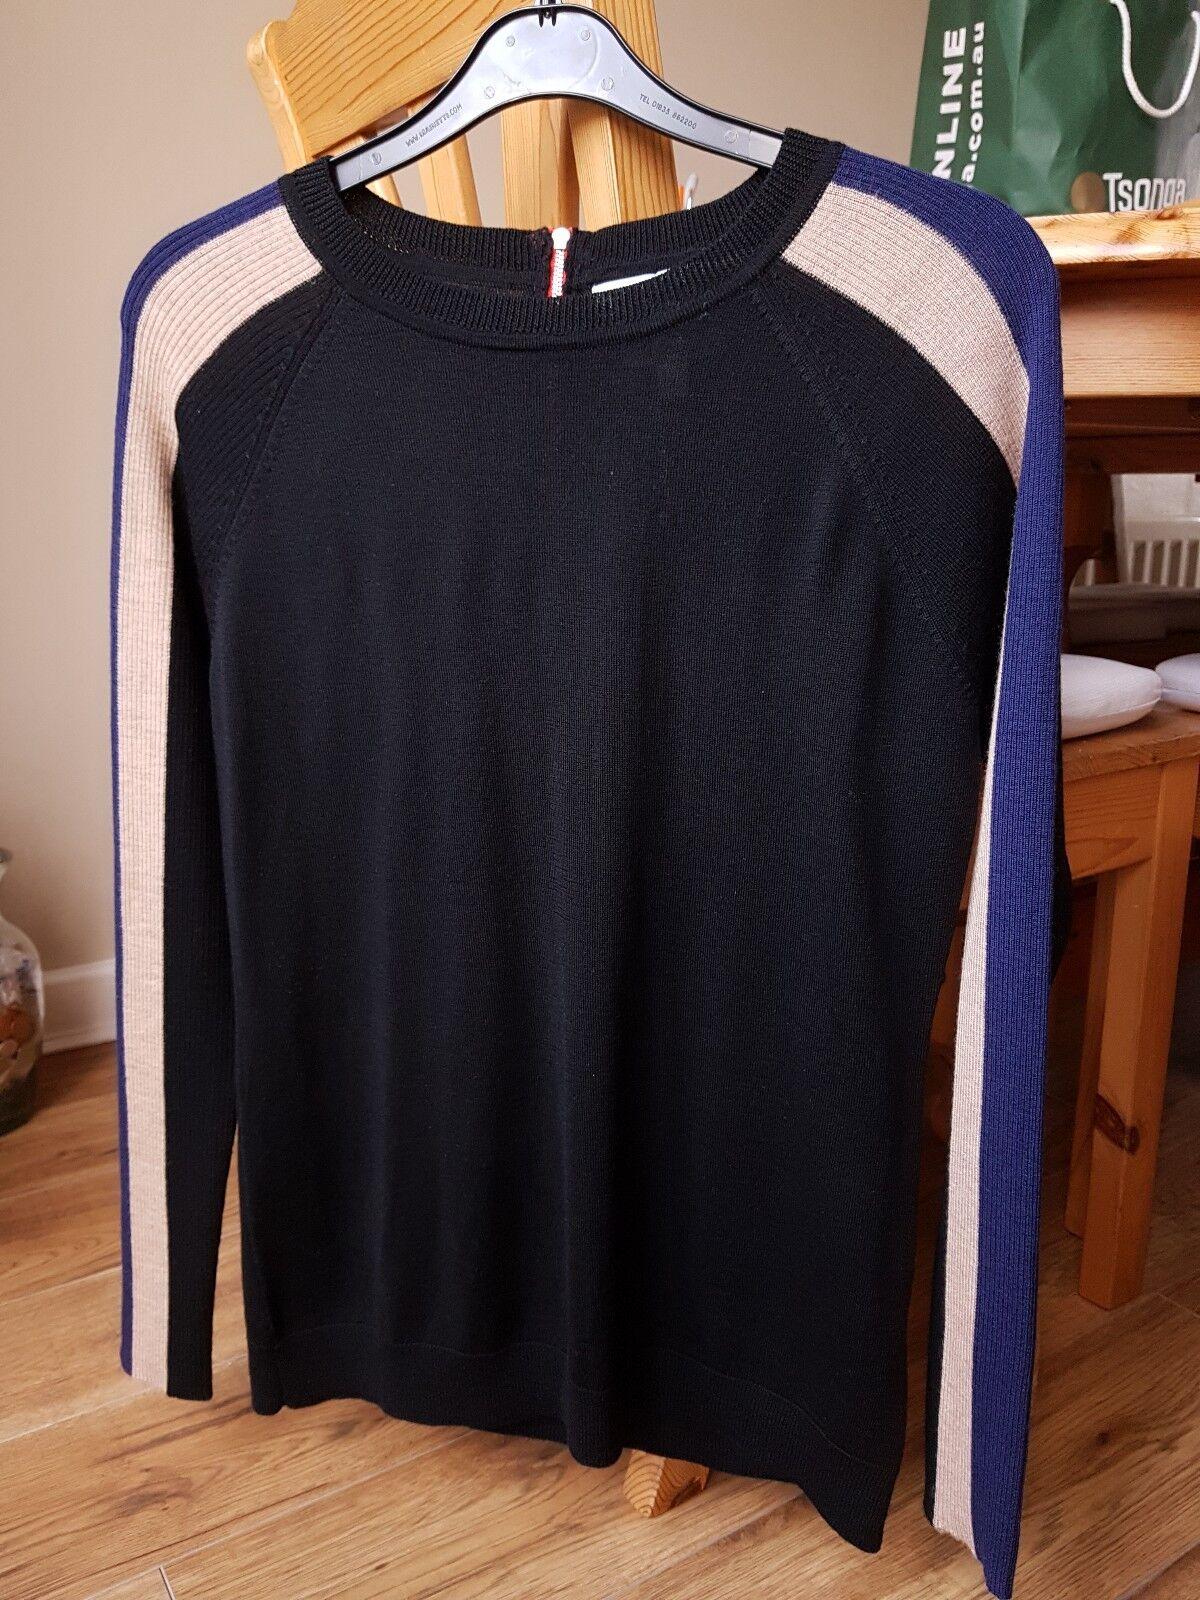 Great Looking 'Clements Ribeiro' Ladies Pure Merino Wool Top.Größe UK14 (L, EU40)